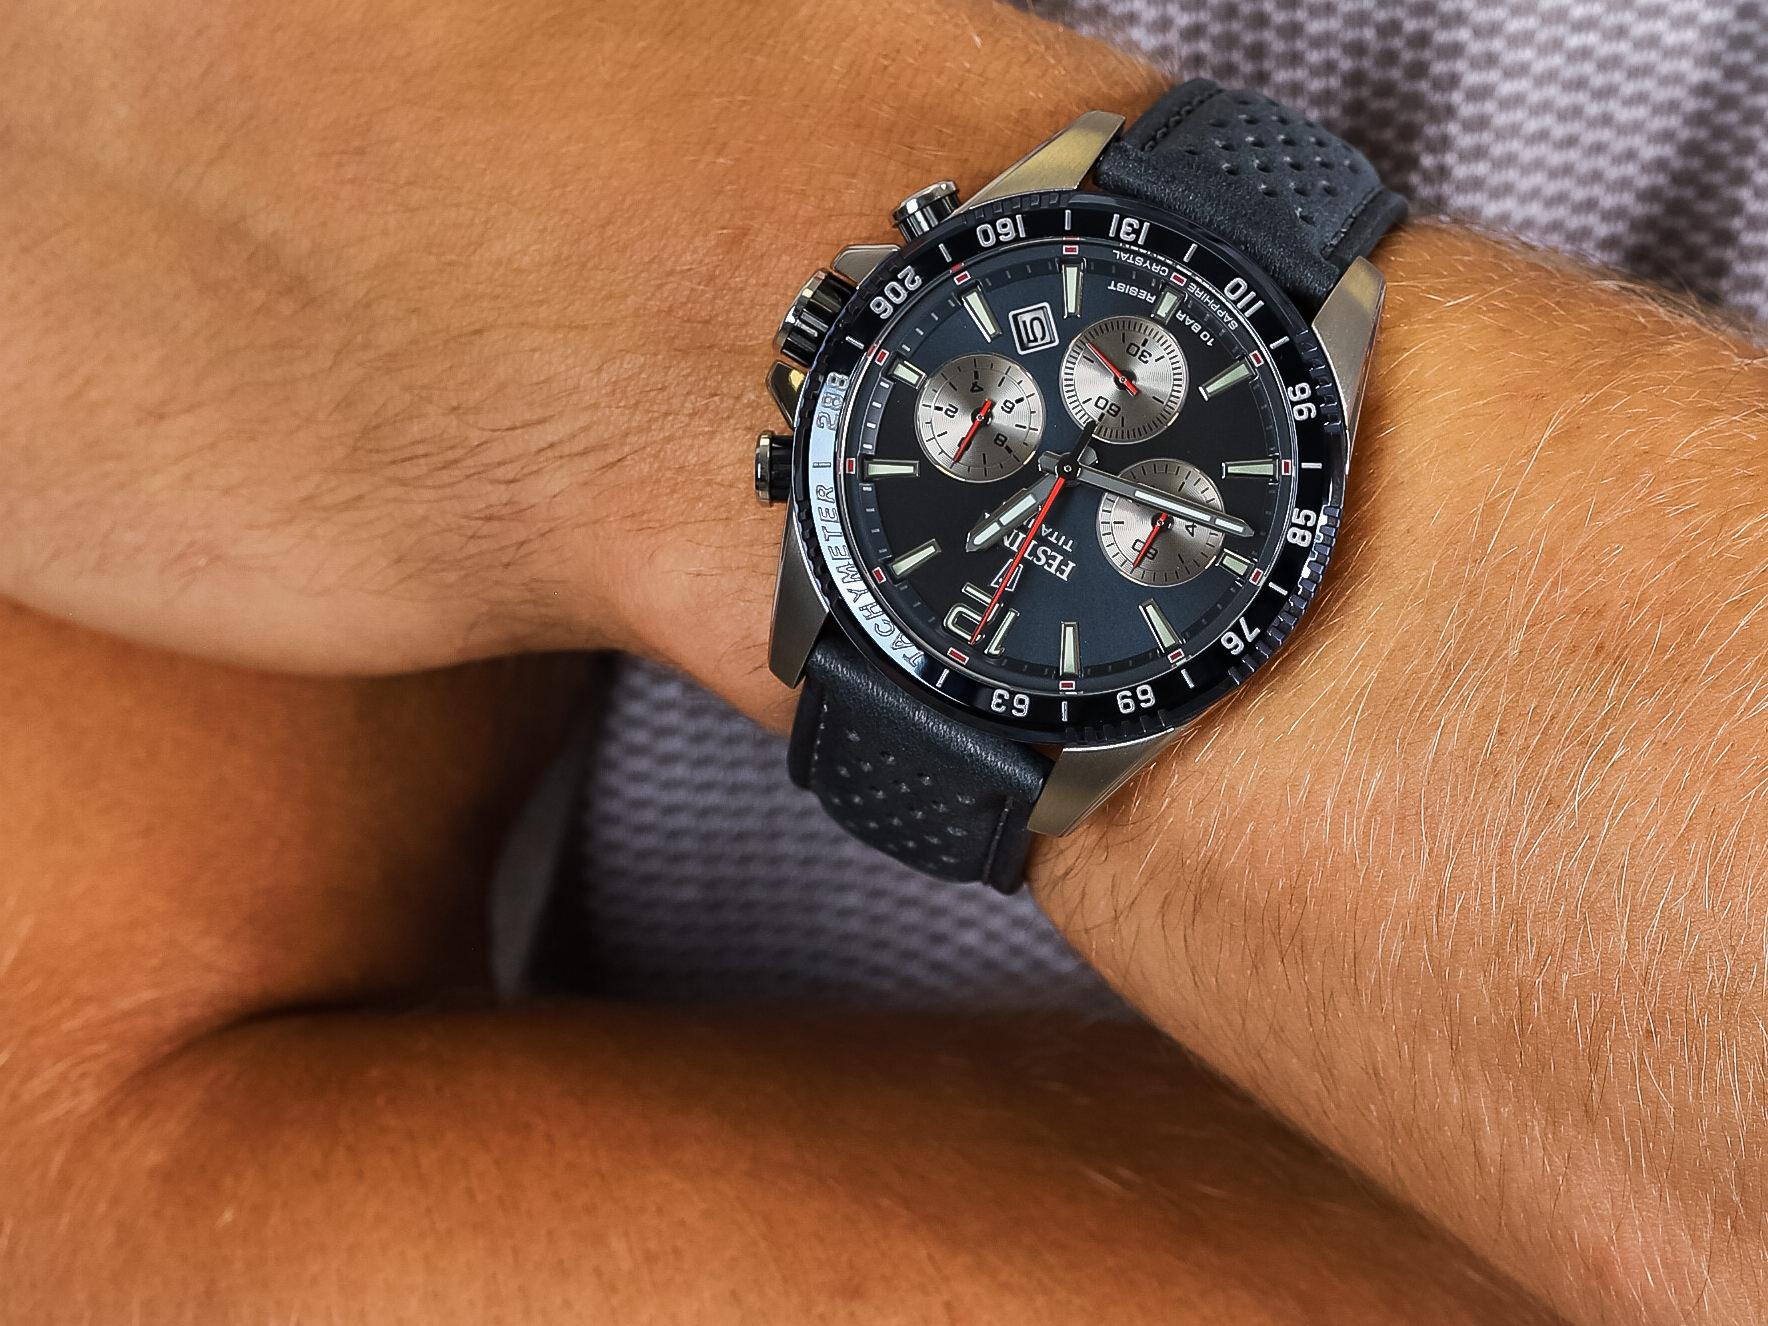 Festina F20521-2 Titanium Sport Chrono Sapphire zegarek sportowy Titanium